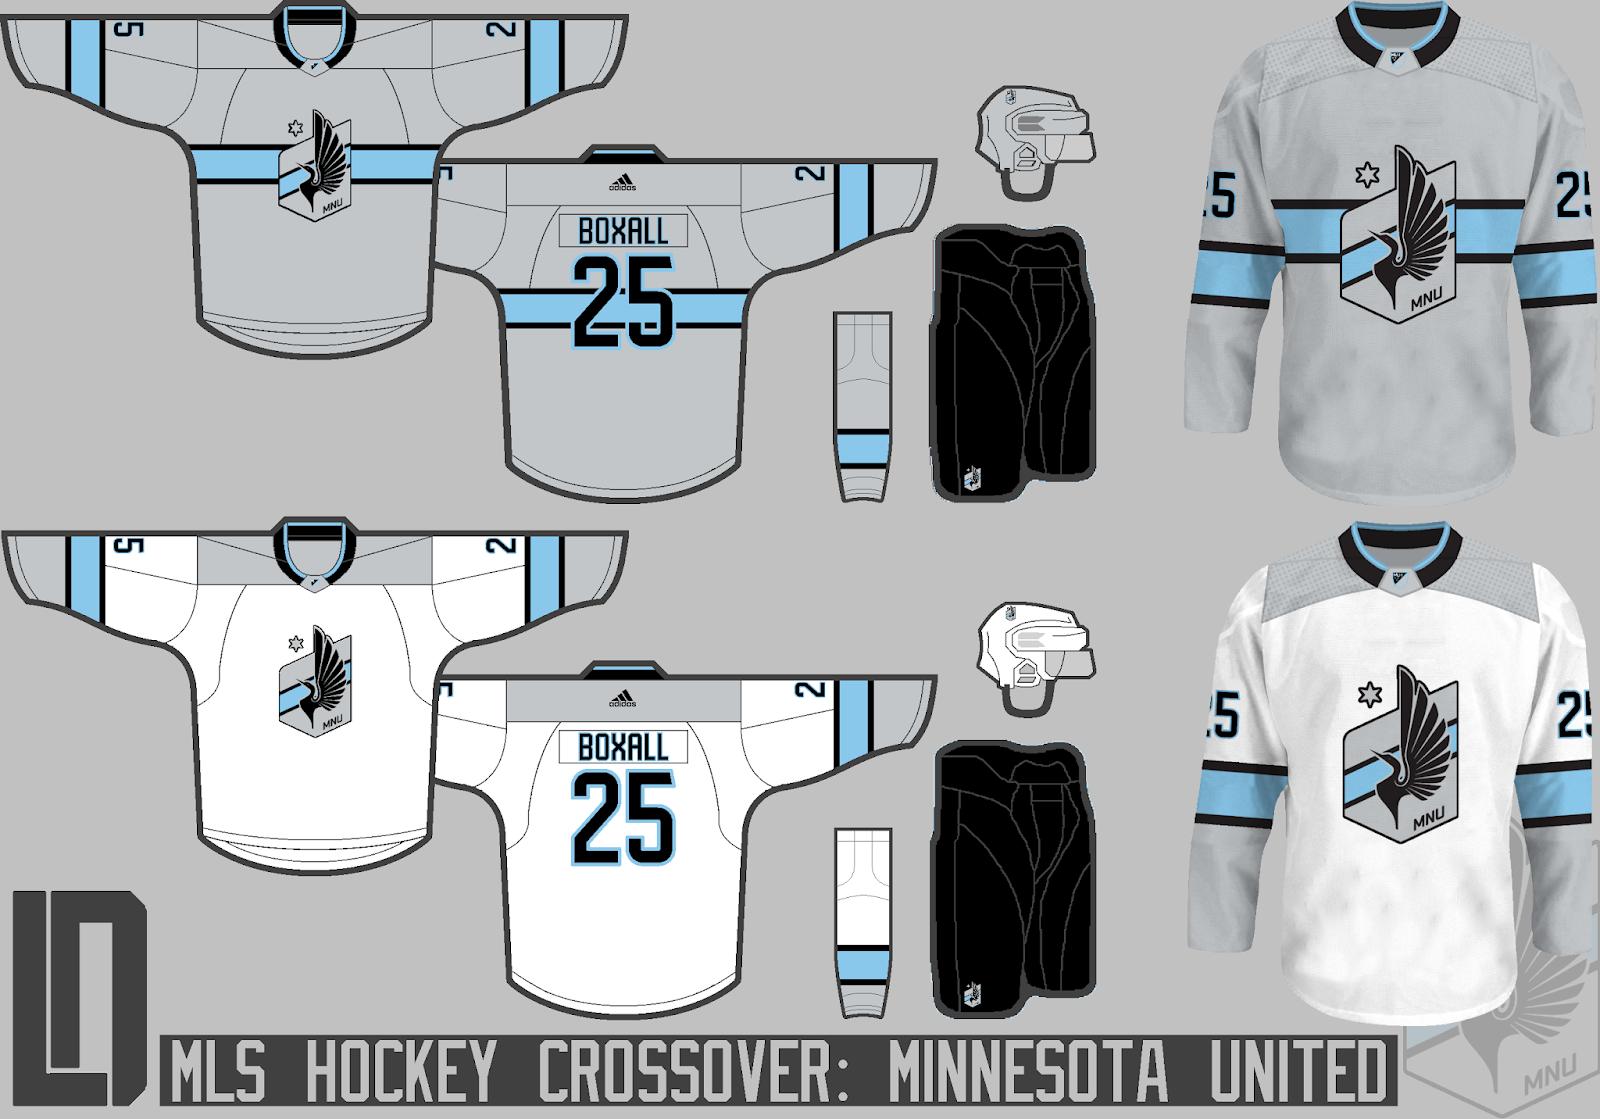 Minnesota+United+Concept.png